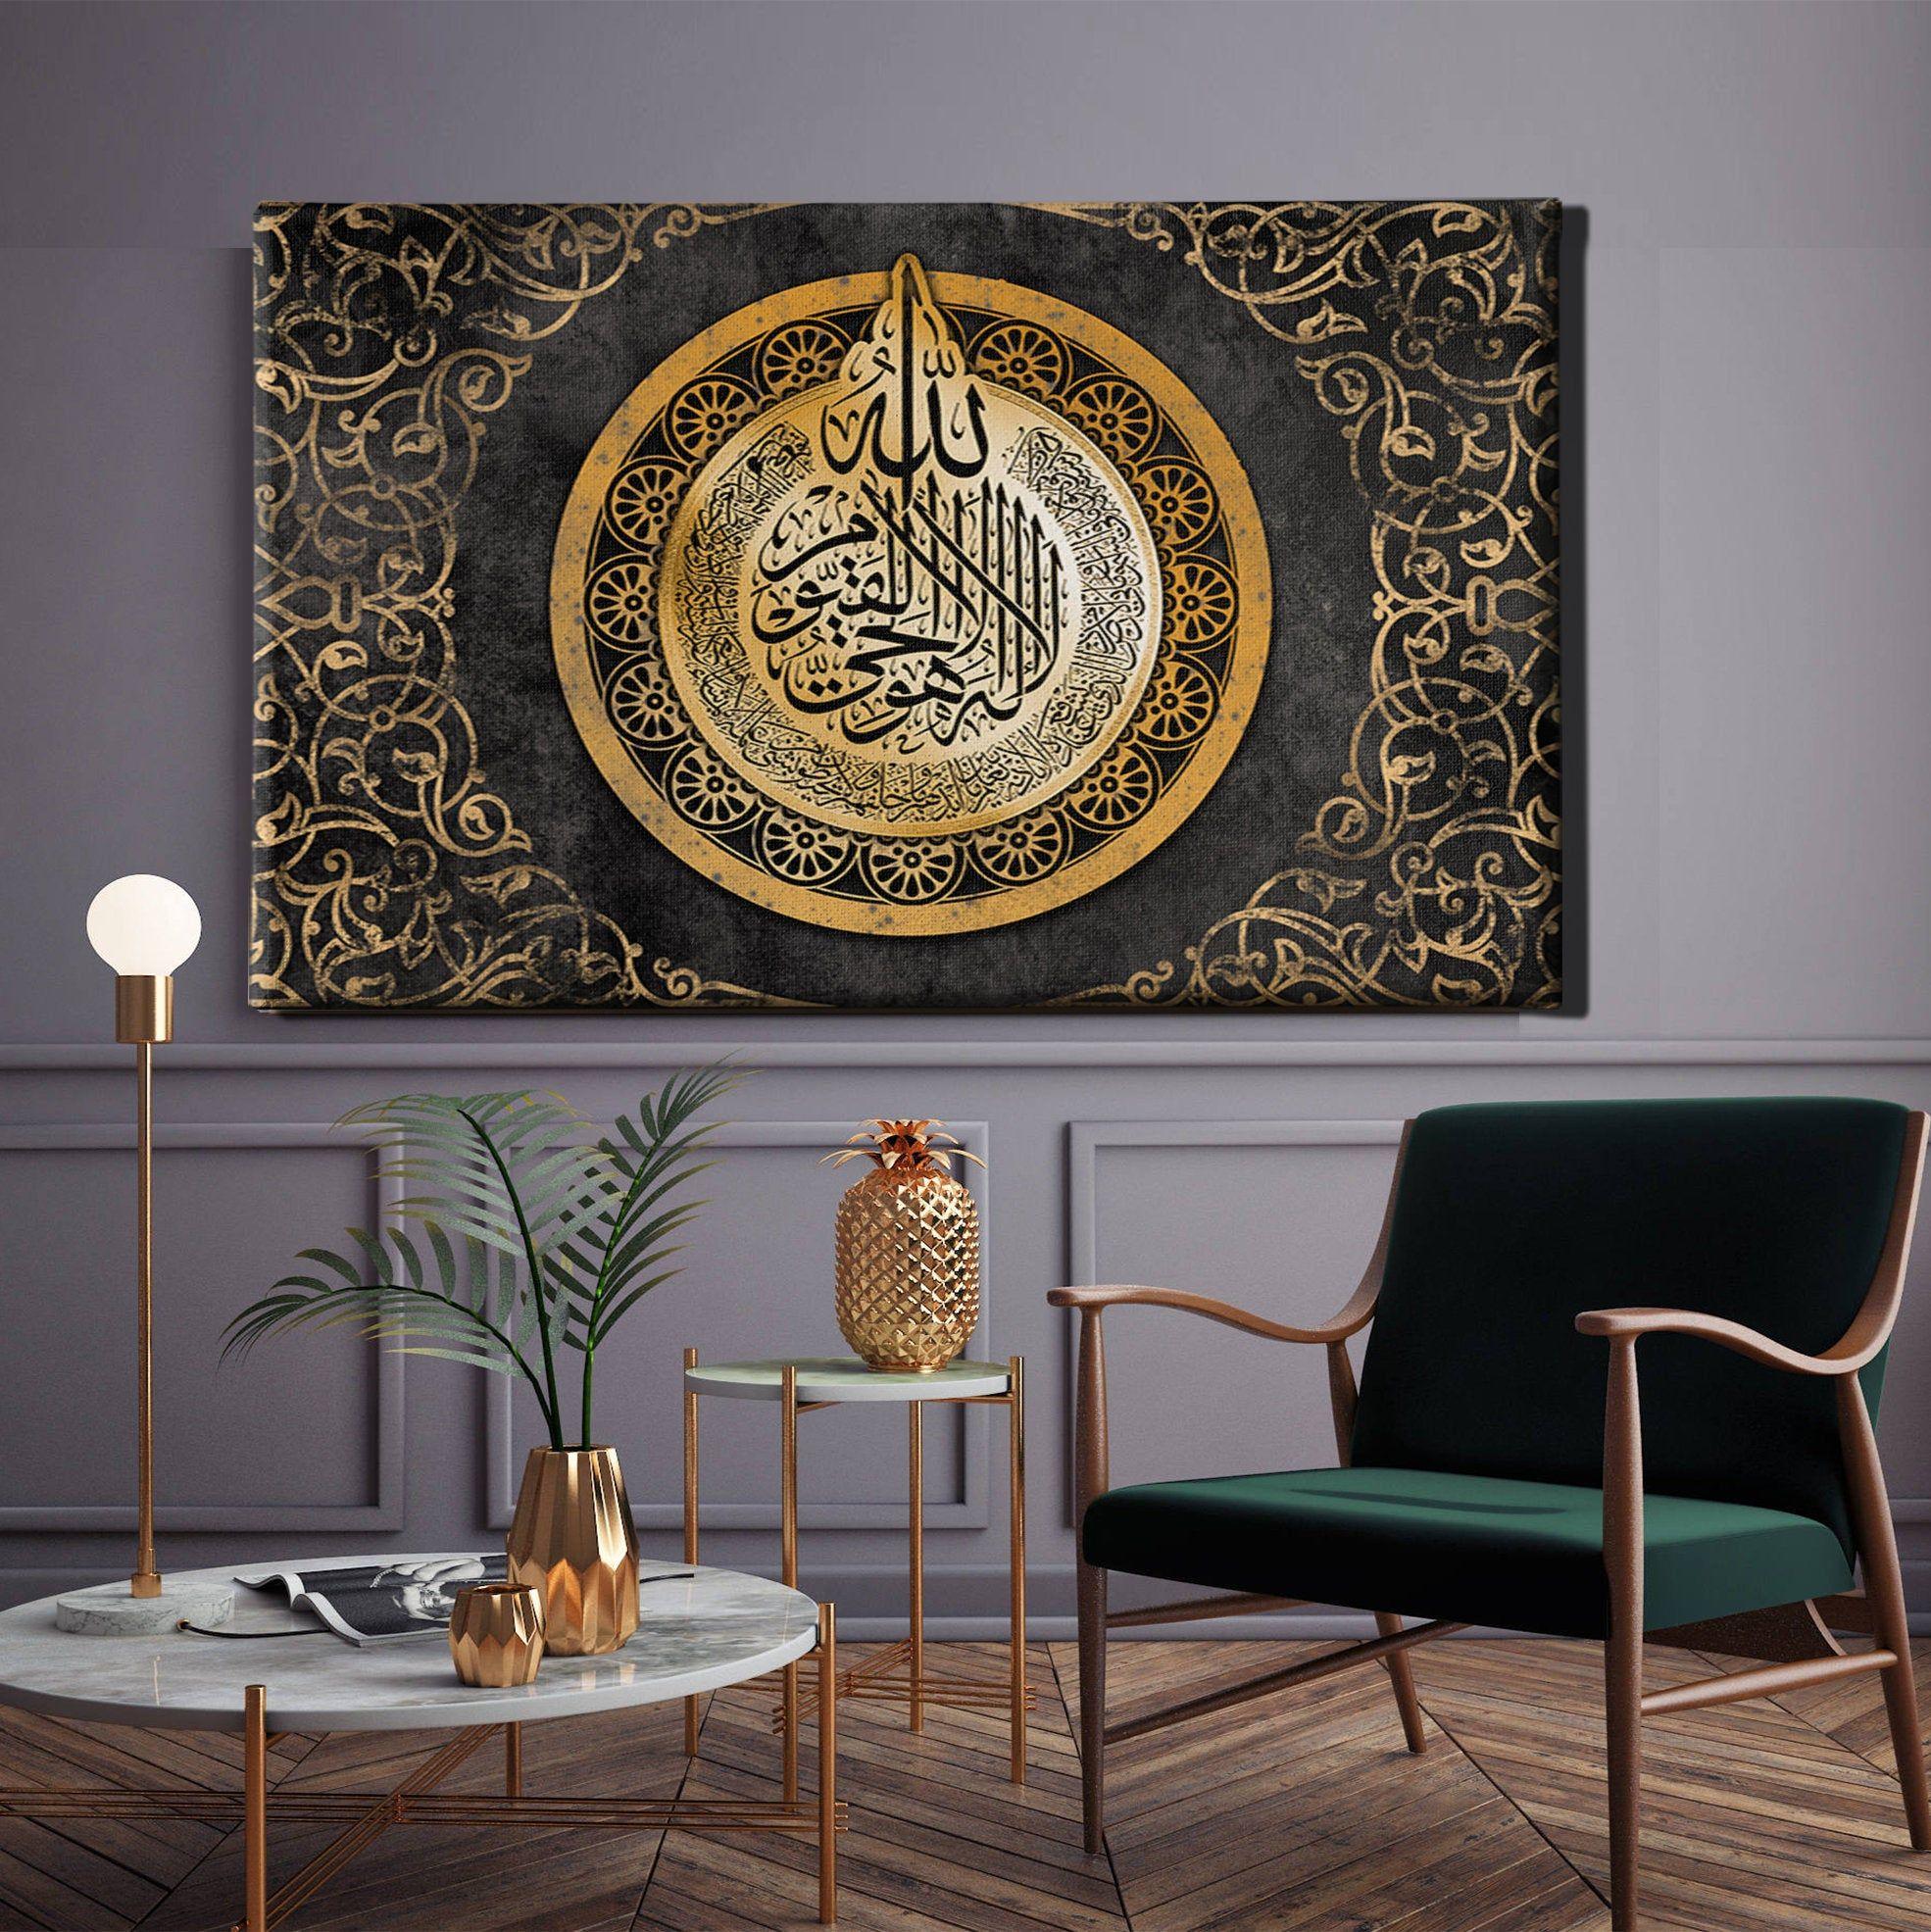 Islamic Wall Art Canvas Framed For Muslim Home Decor Quran Etsy Islamic Wall Art Calligraphy Wall Art Islamic Decor